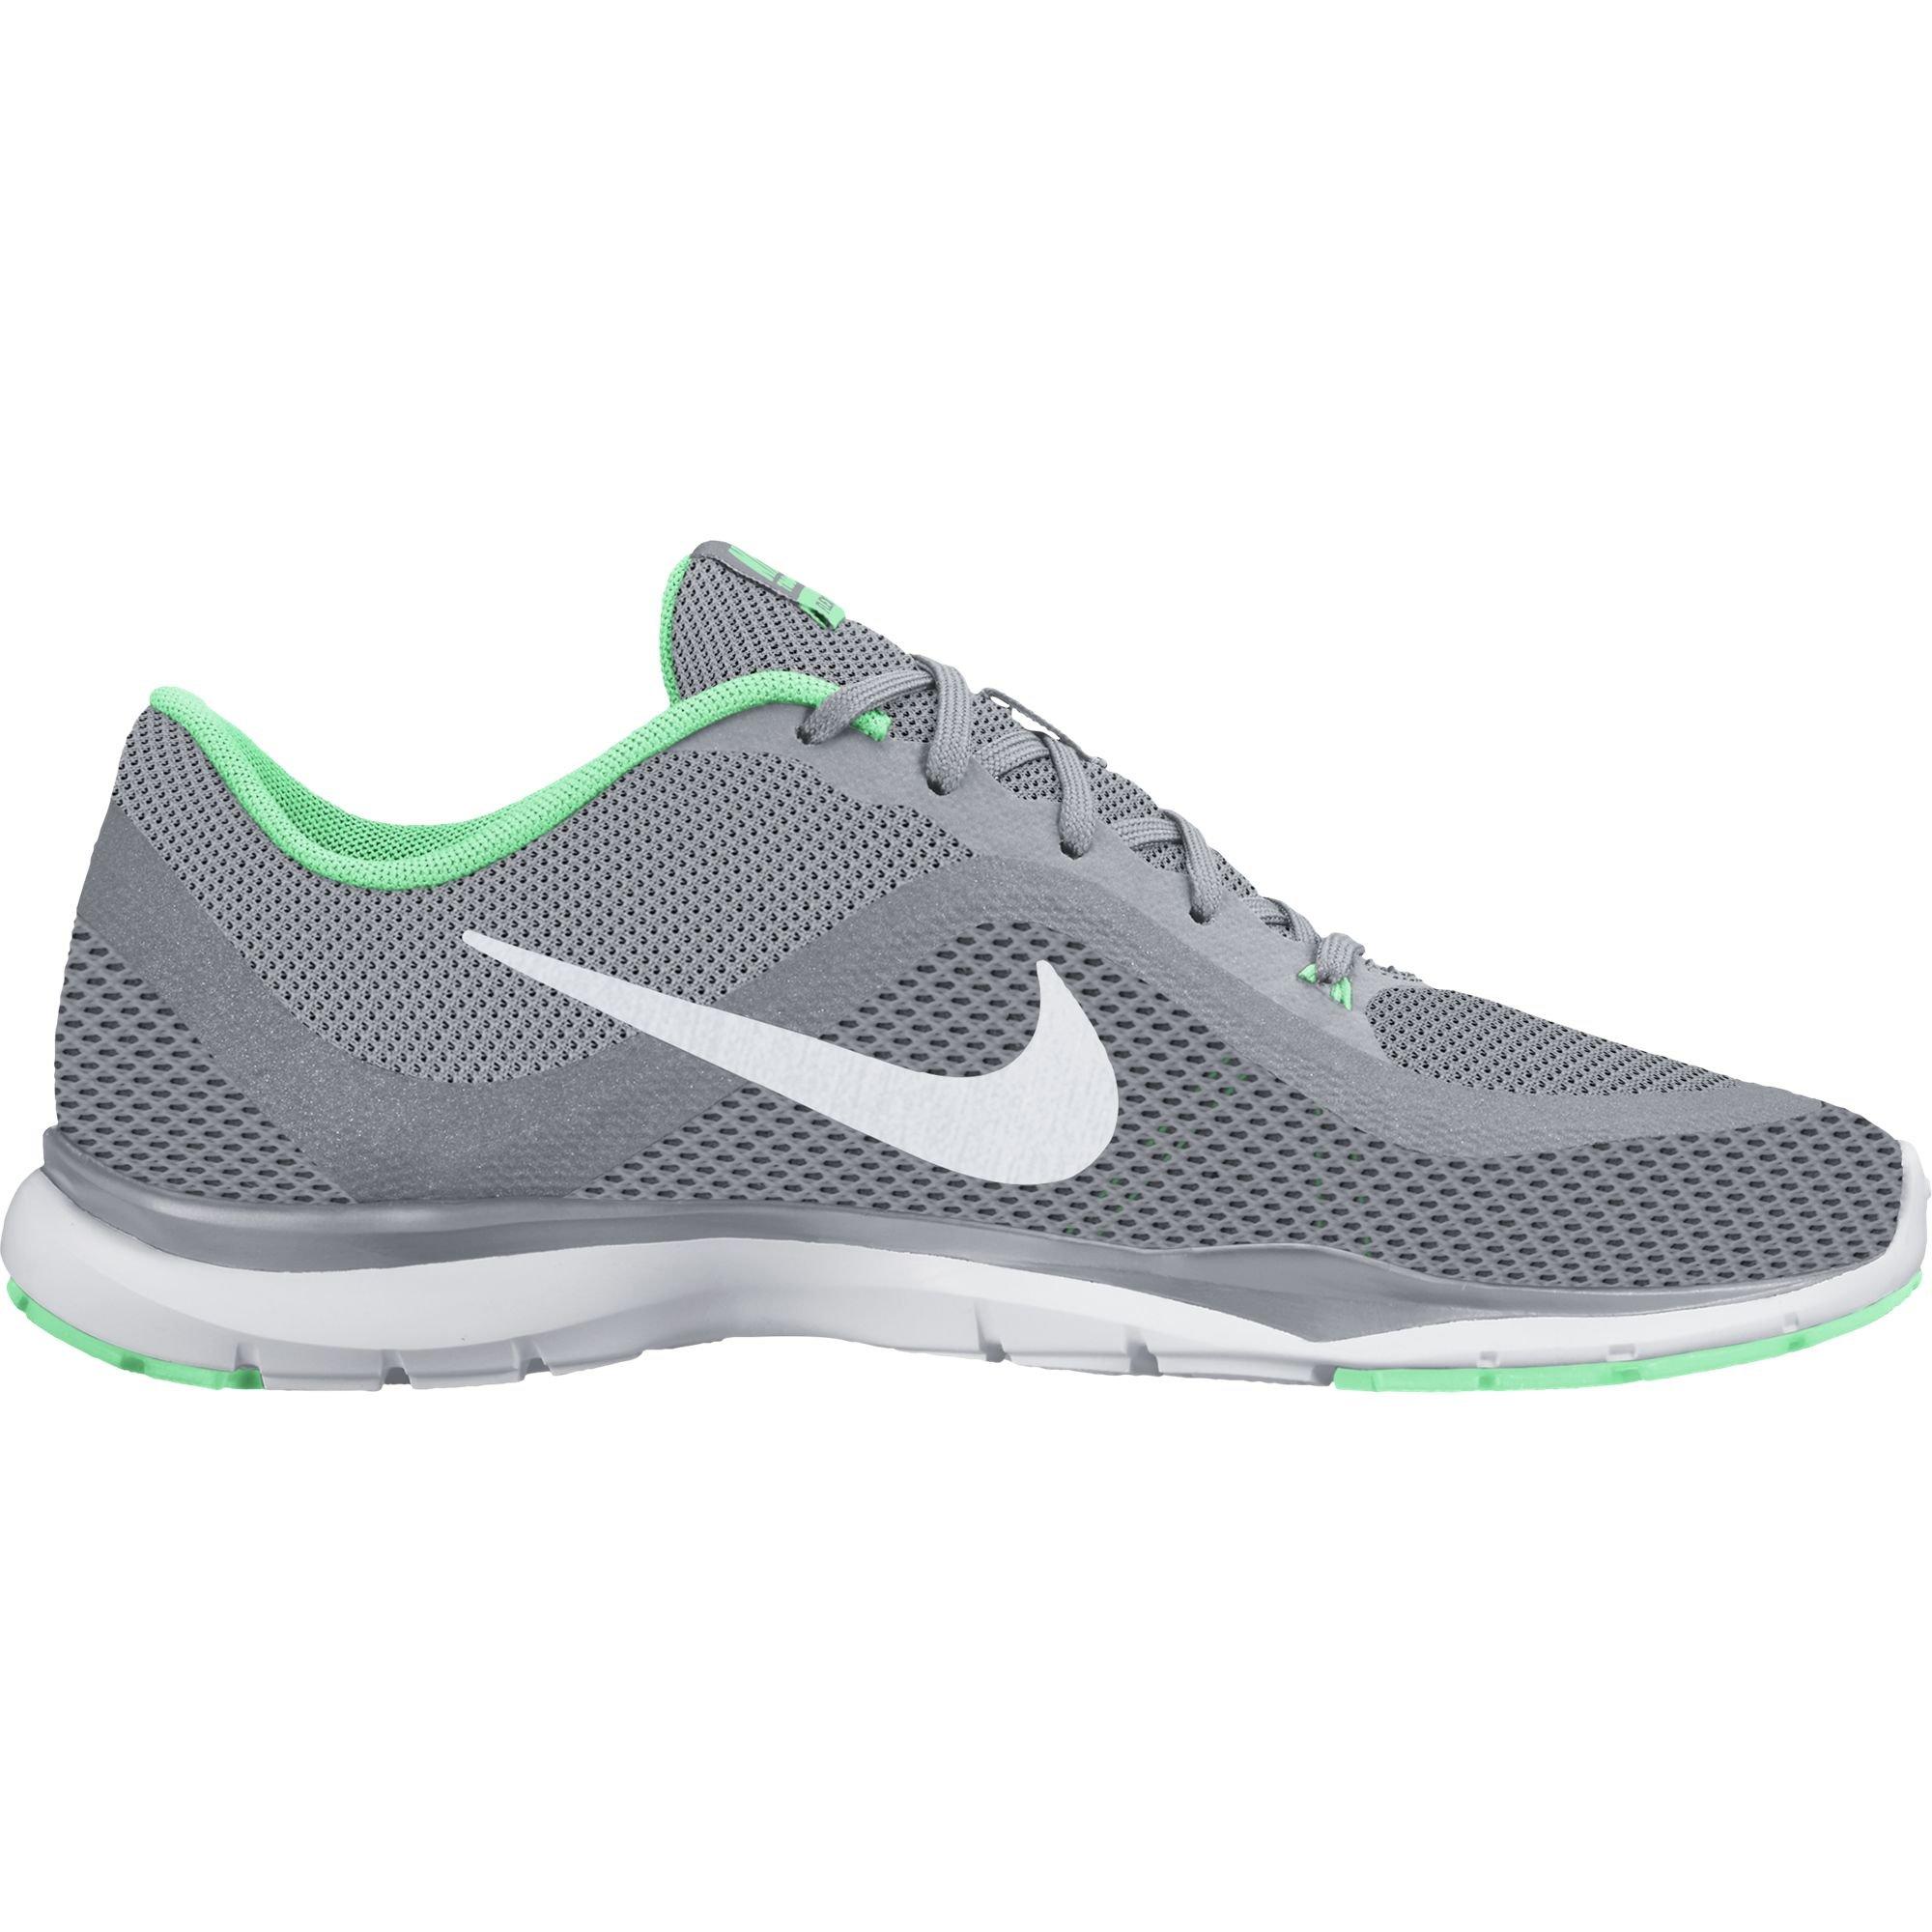 Nike Women's Flex Trainer 6 Training Shoes Wolf Grey/Platinum/Green Glow Size 9.5 M US